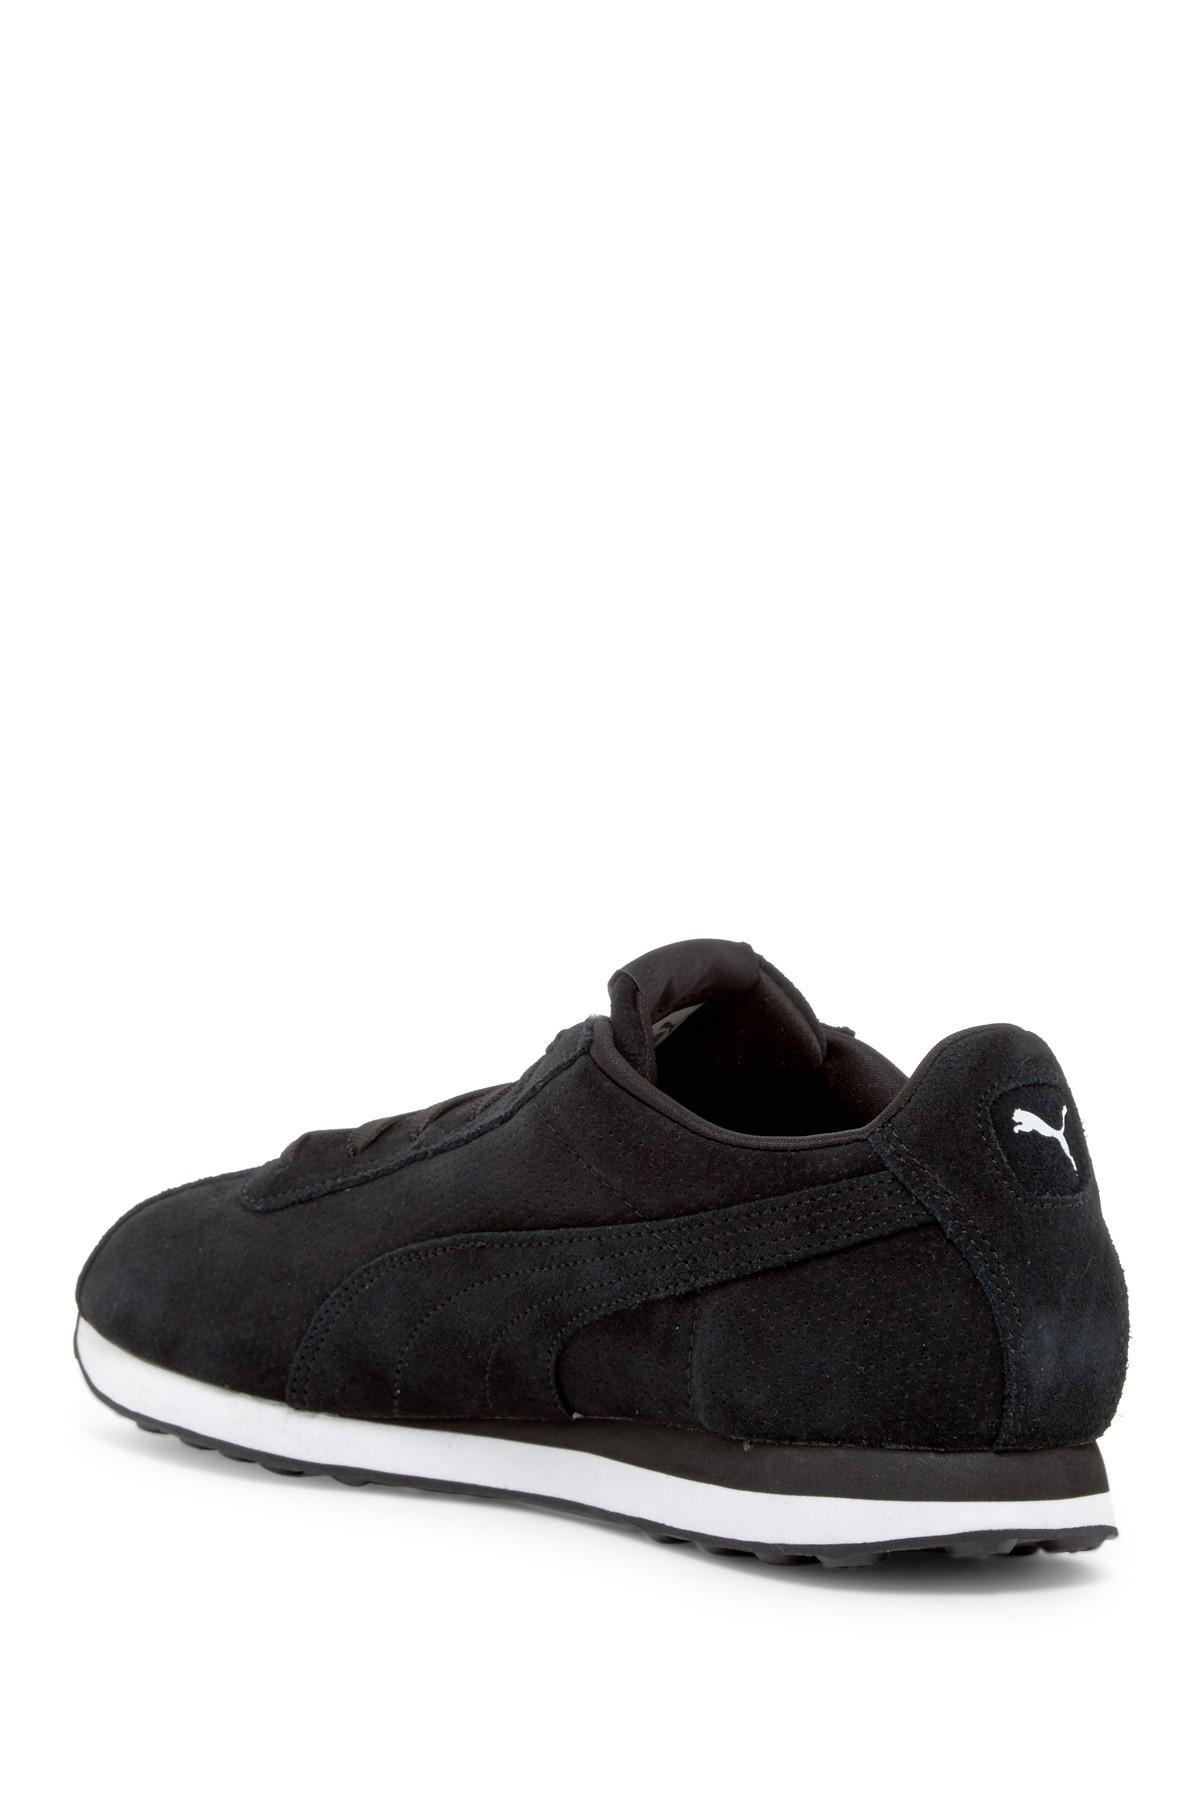 PUMA Turin Suede Sneaker in Black for